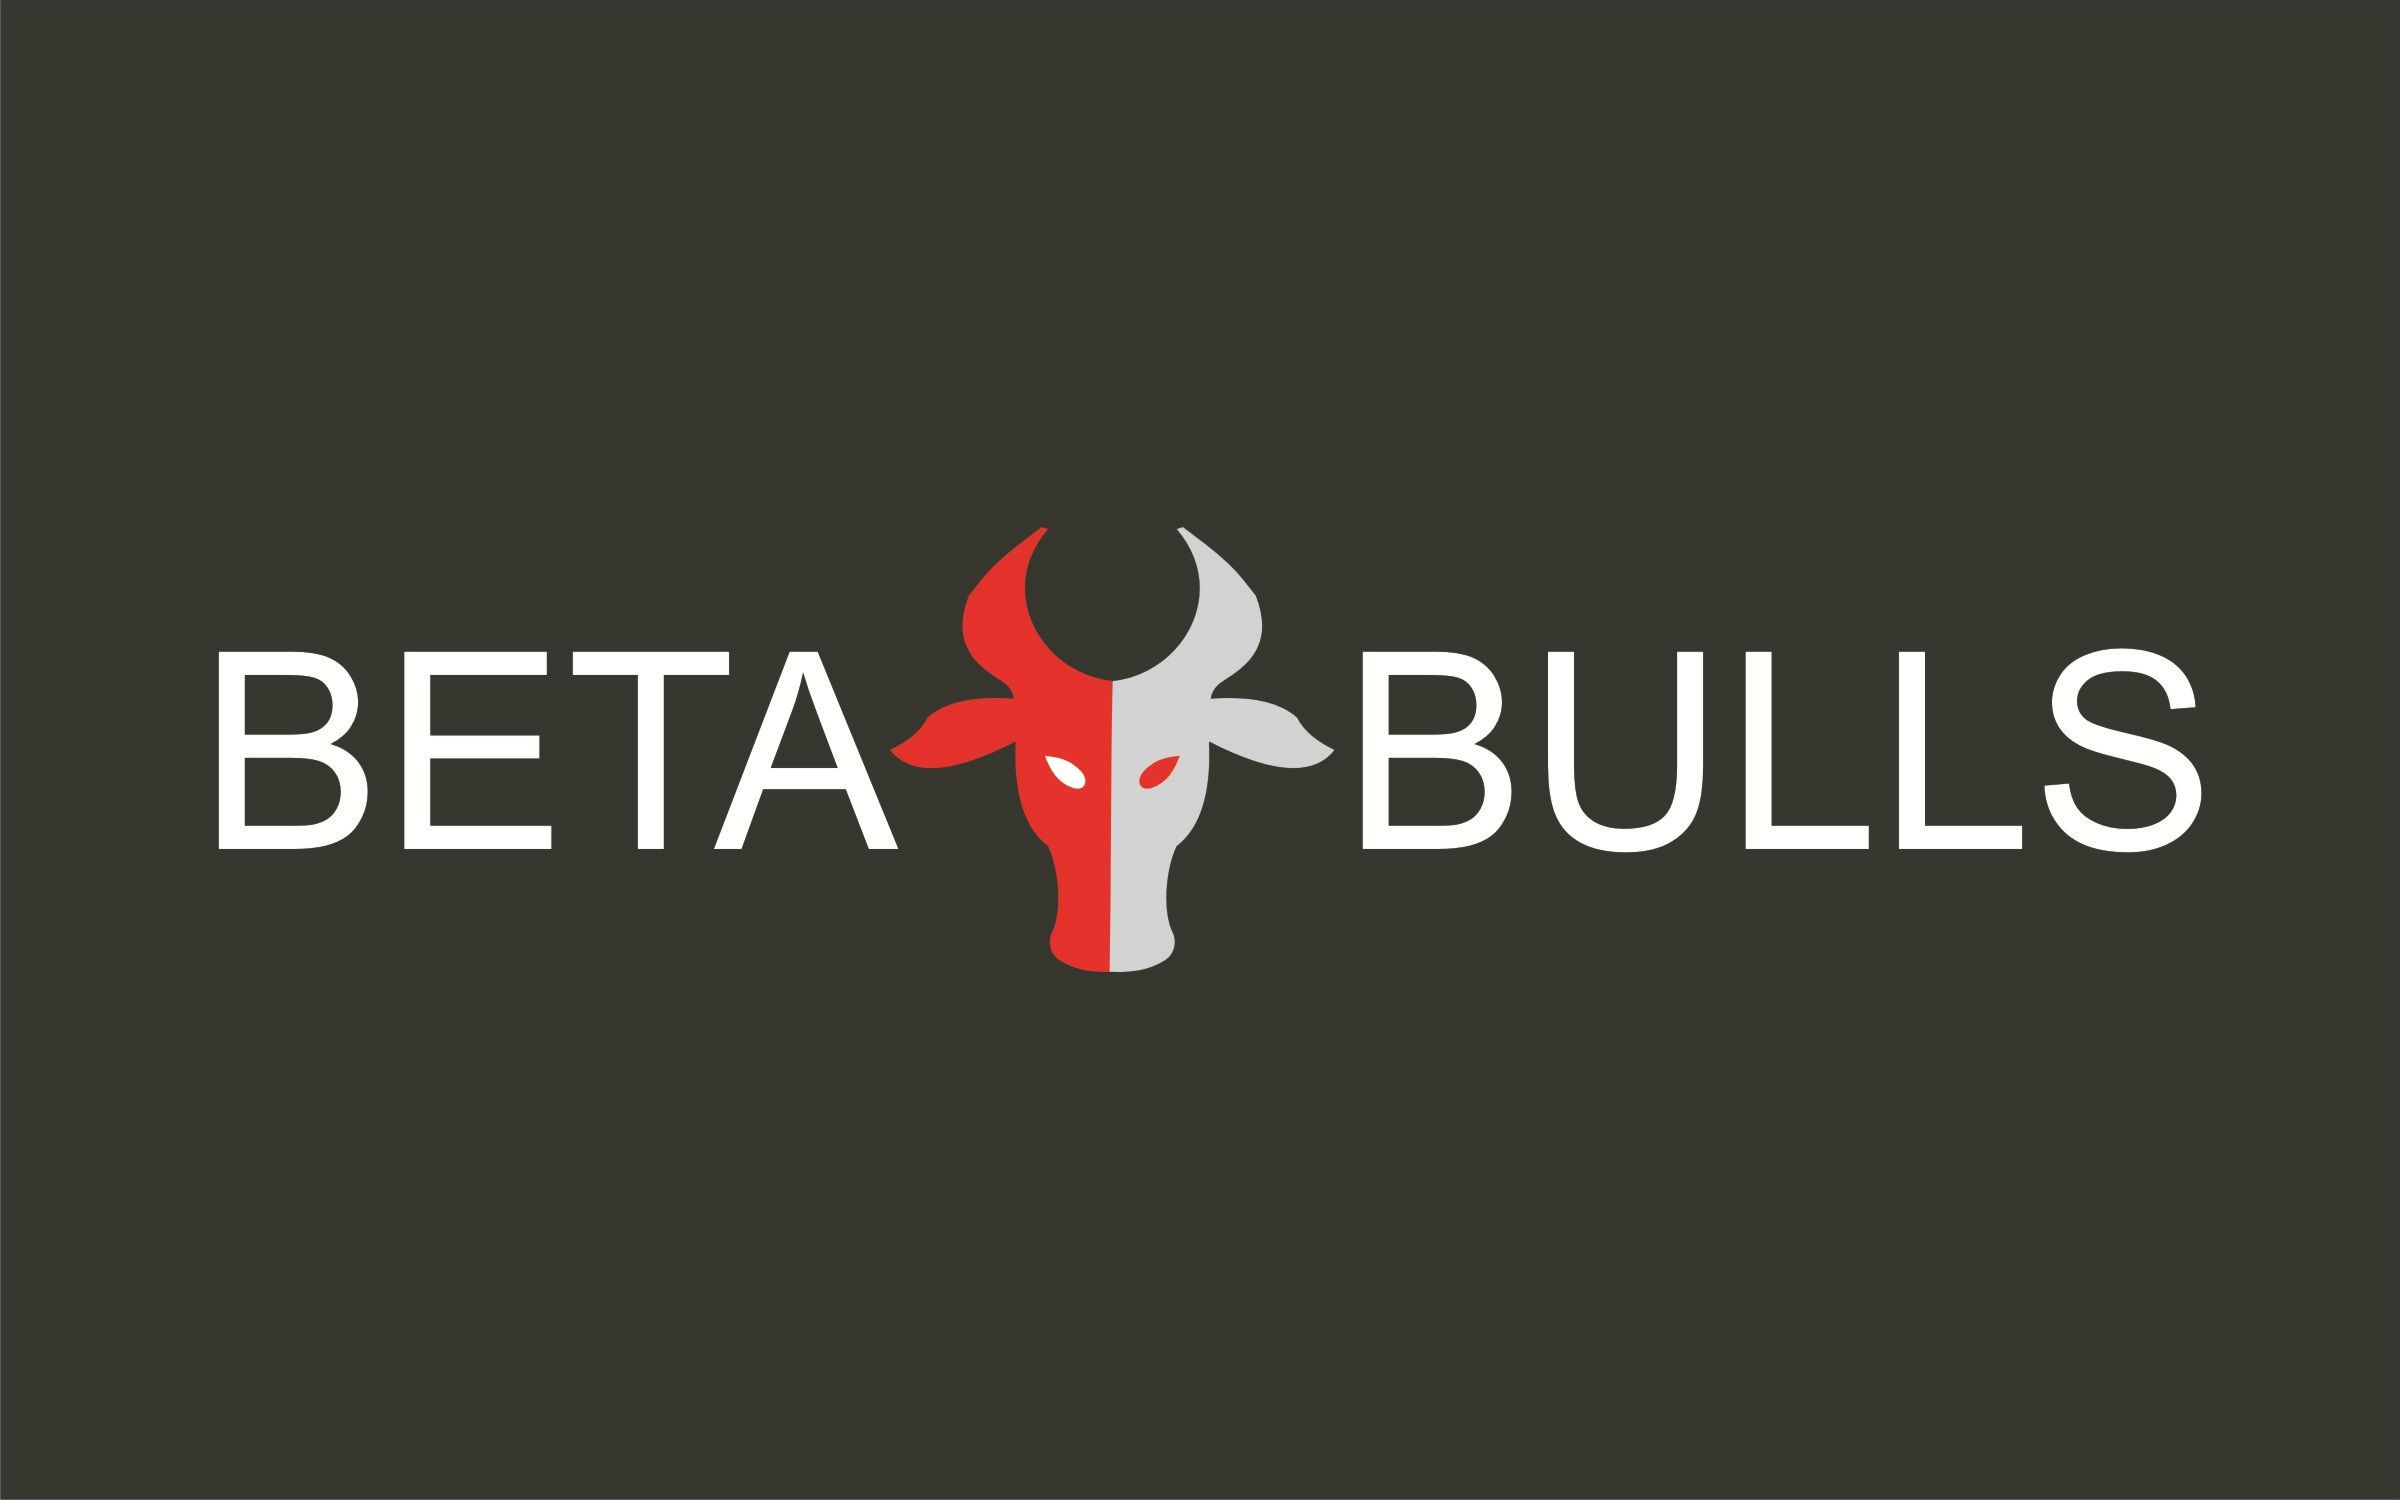 BetaBulls - We Develop software in Lean WAY